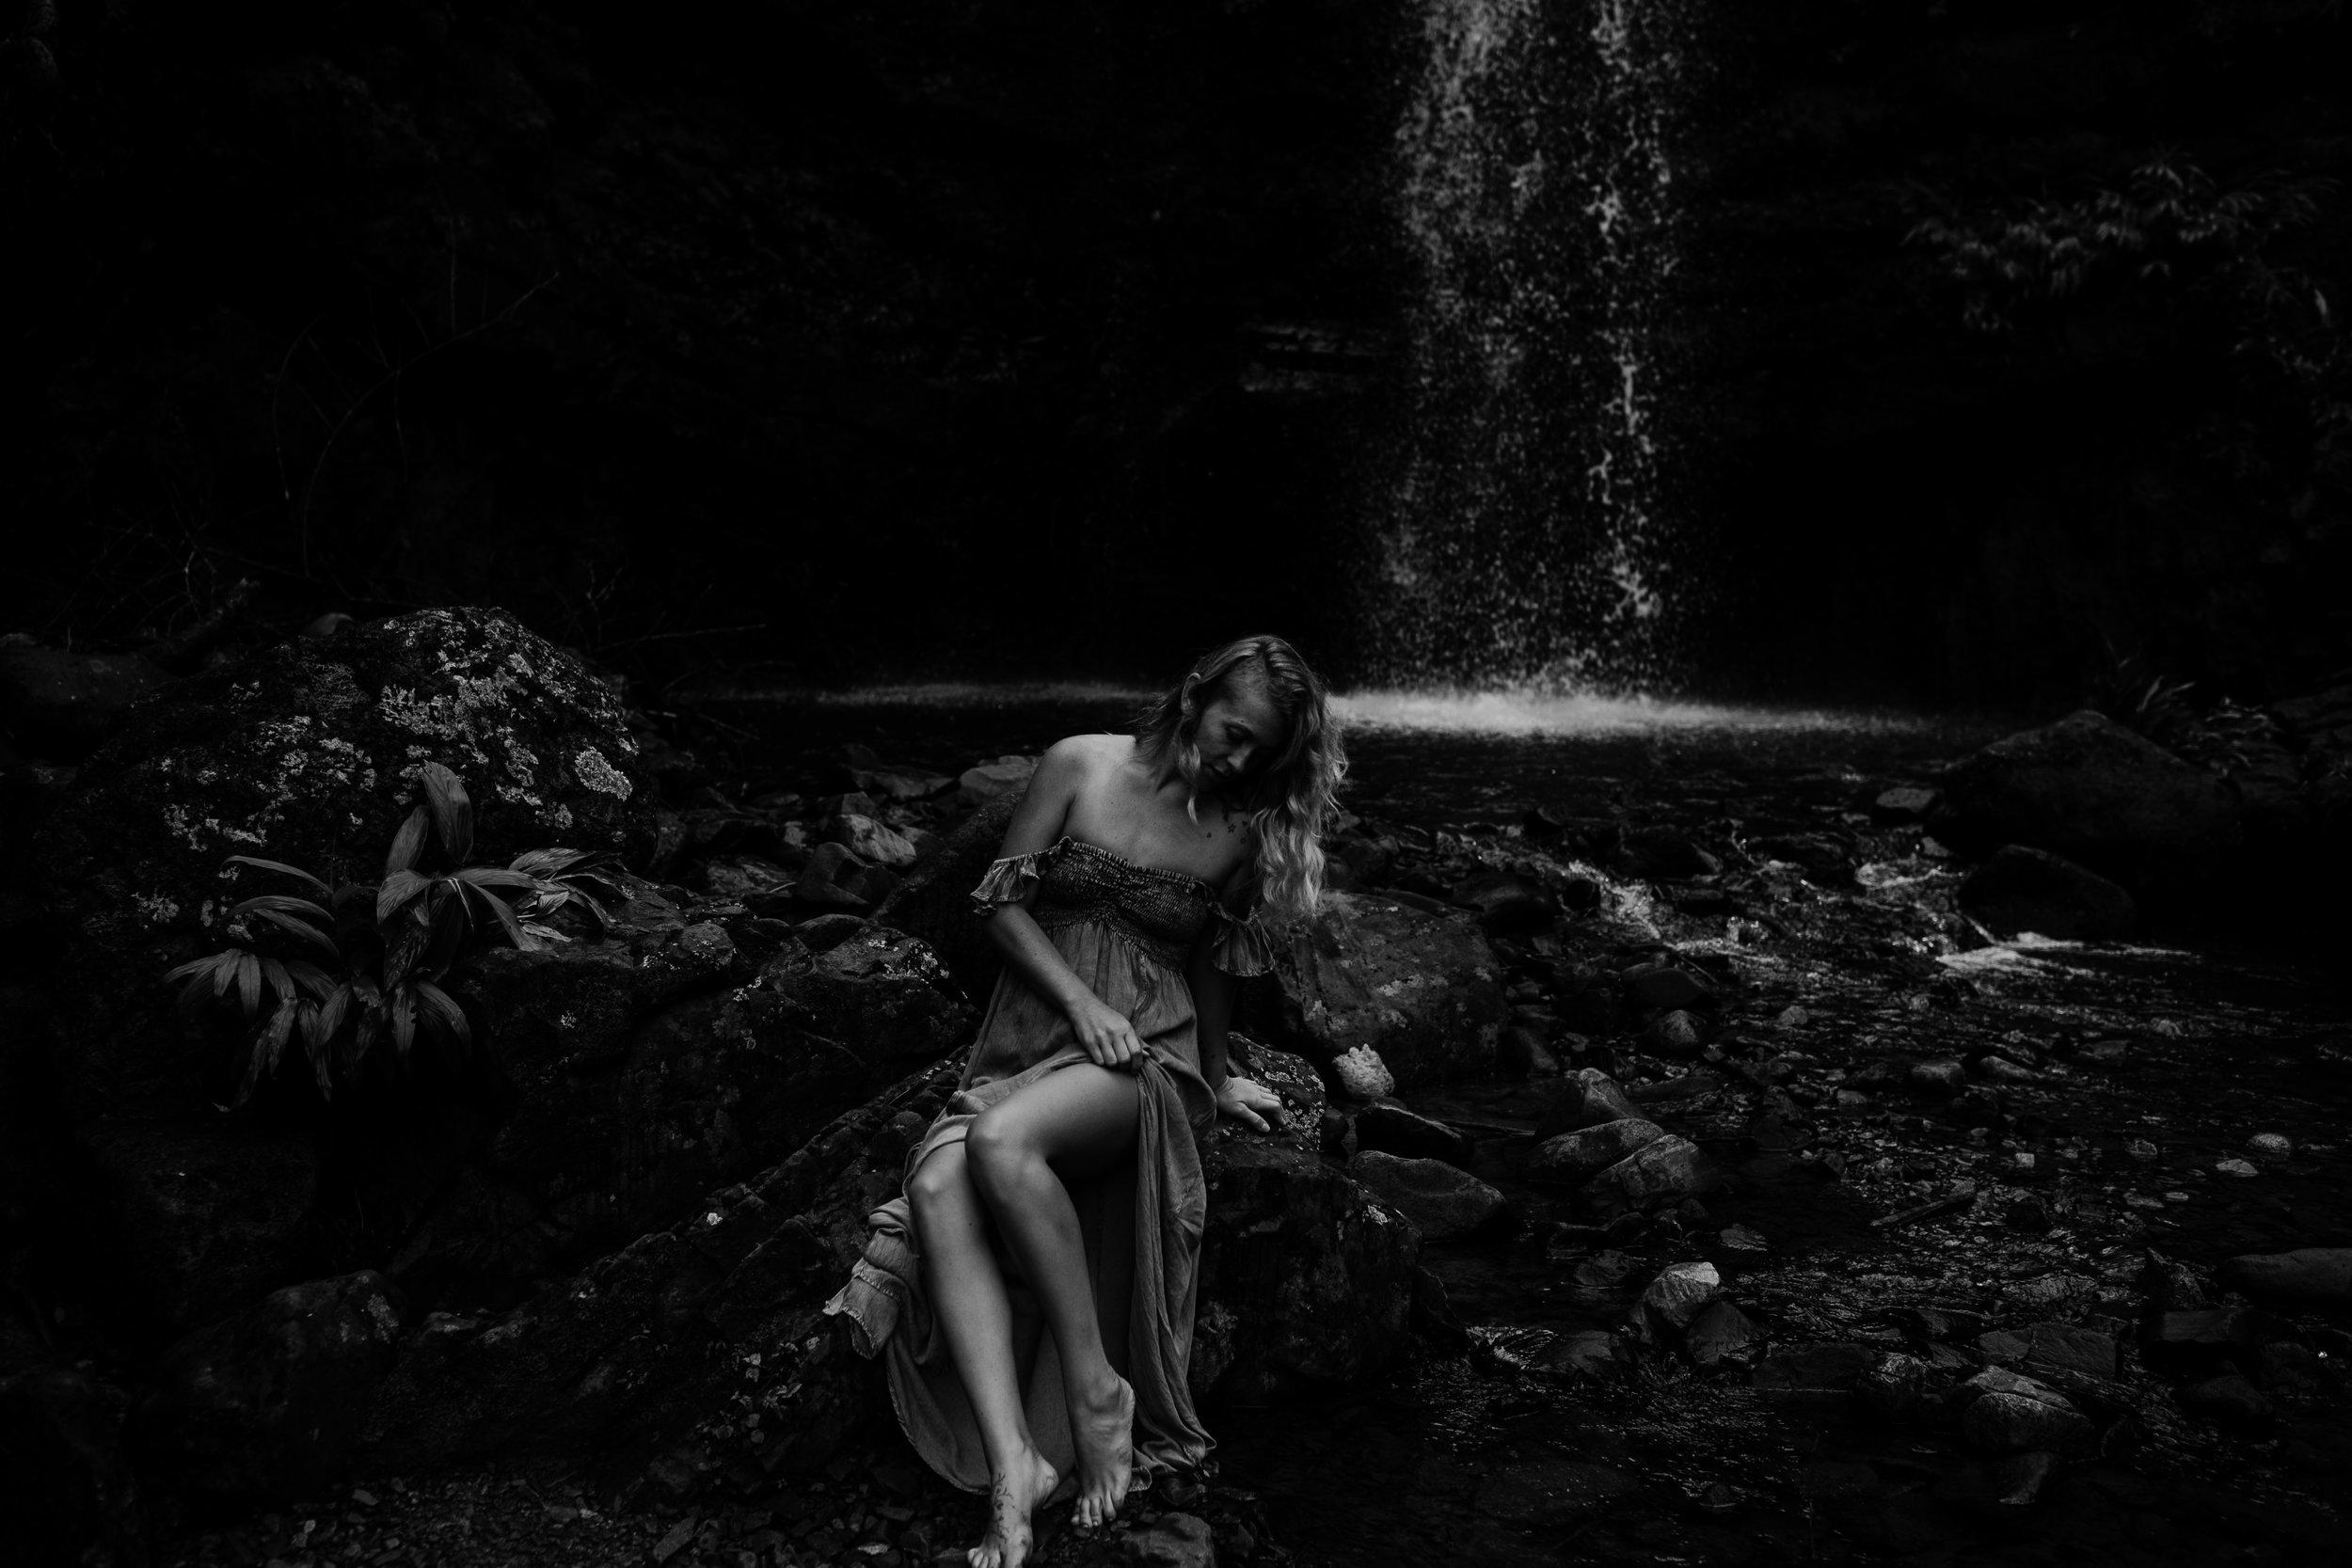 waterfall-self-3.jpg